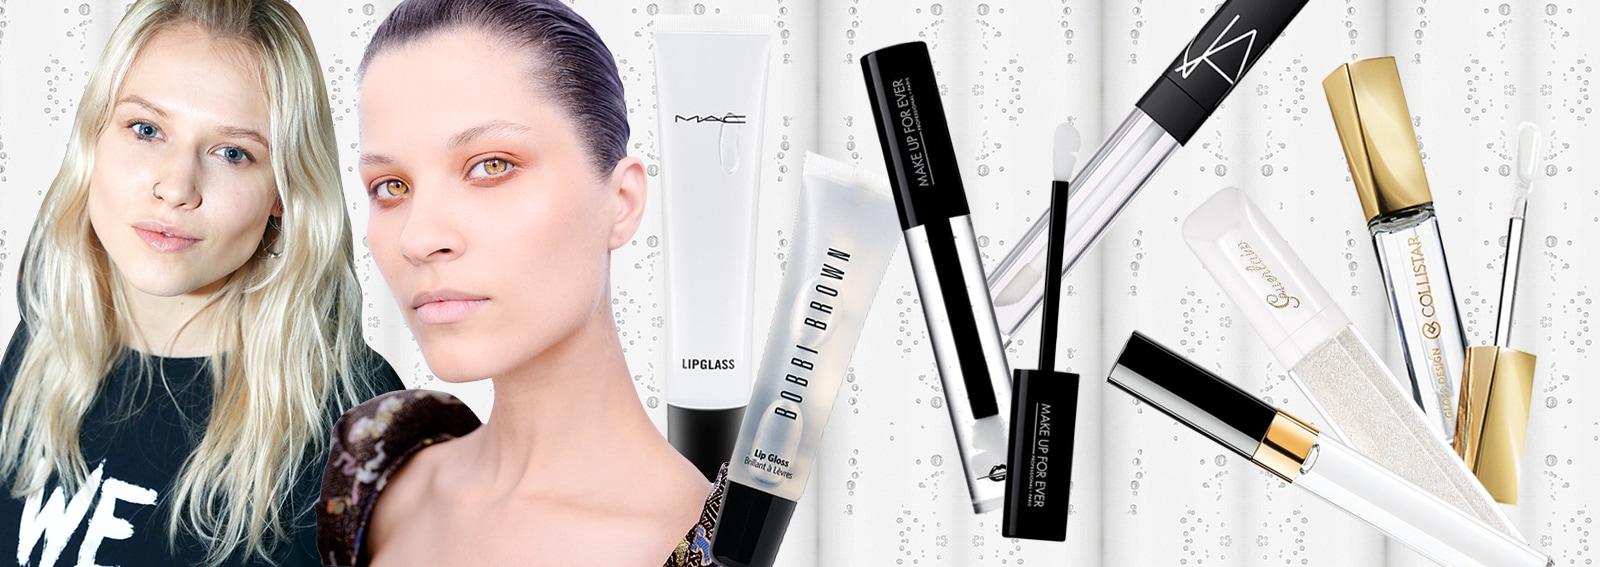 collage-labbra-naturali-gloss-lucidalabbra-trasparente-cover-desktop